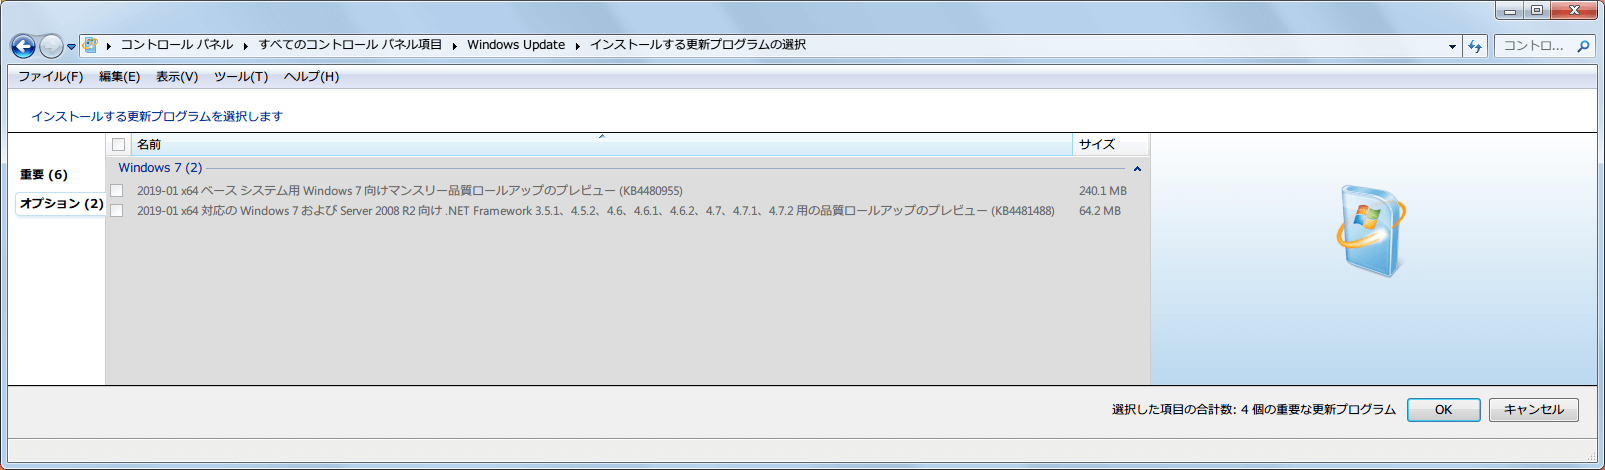 Windows 7 64bit Windows Update オプション 2019年1月分リスト KB4480955、KB4481488 非表示